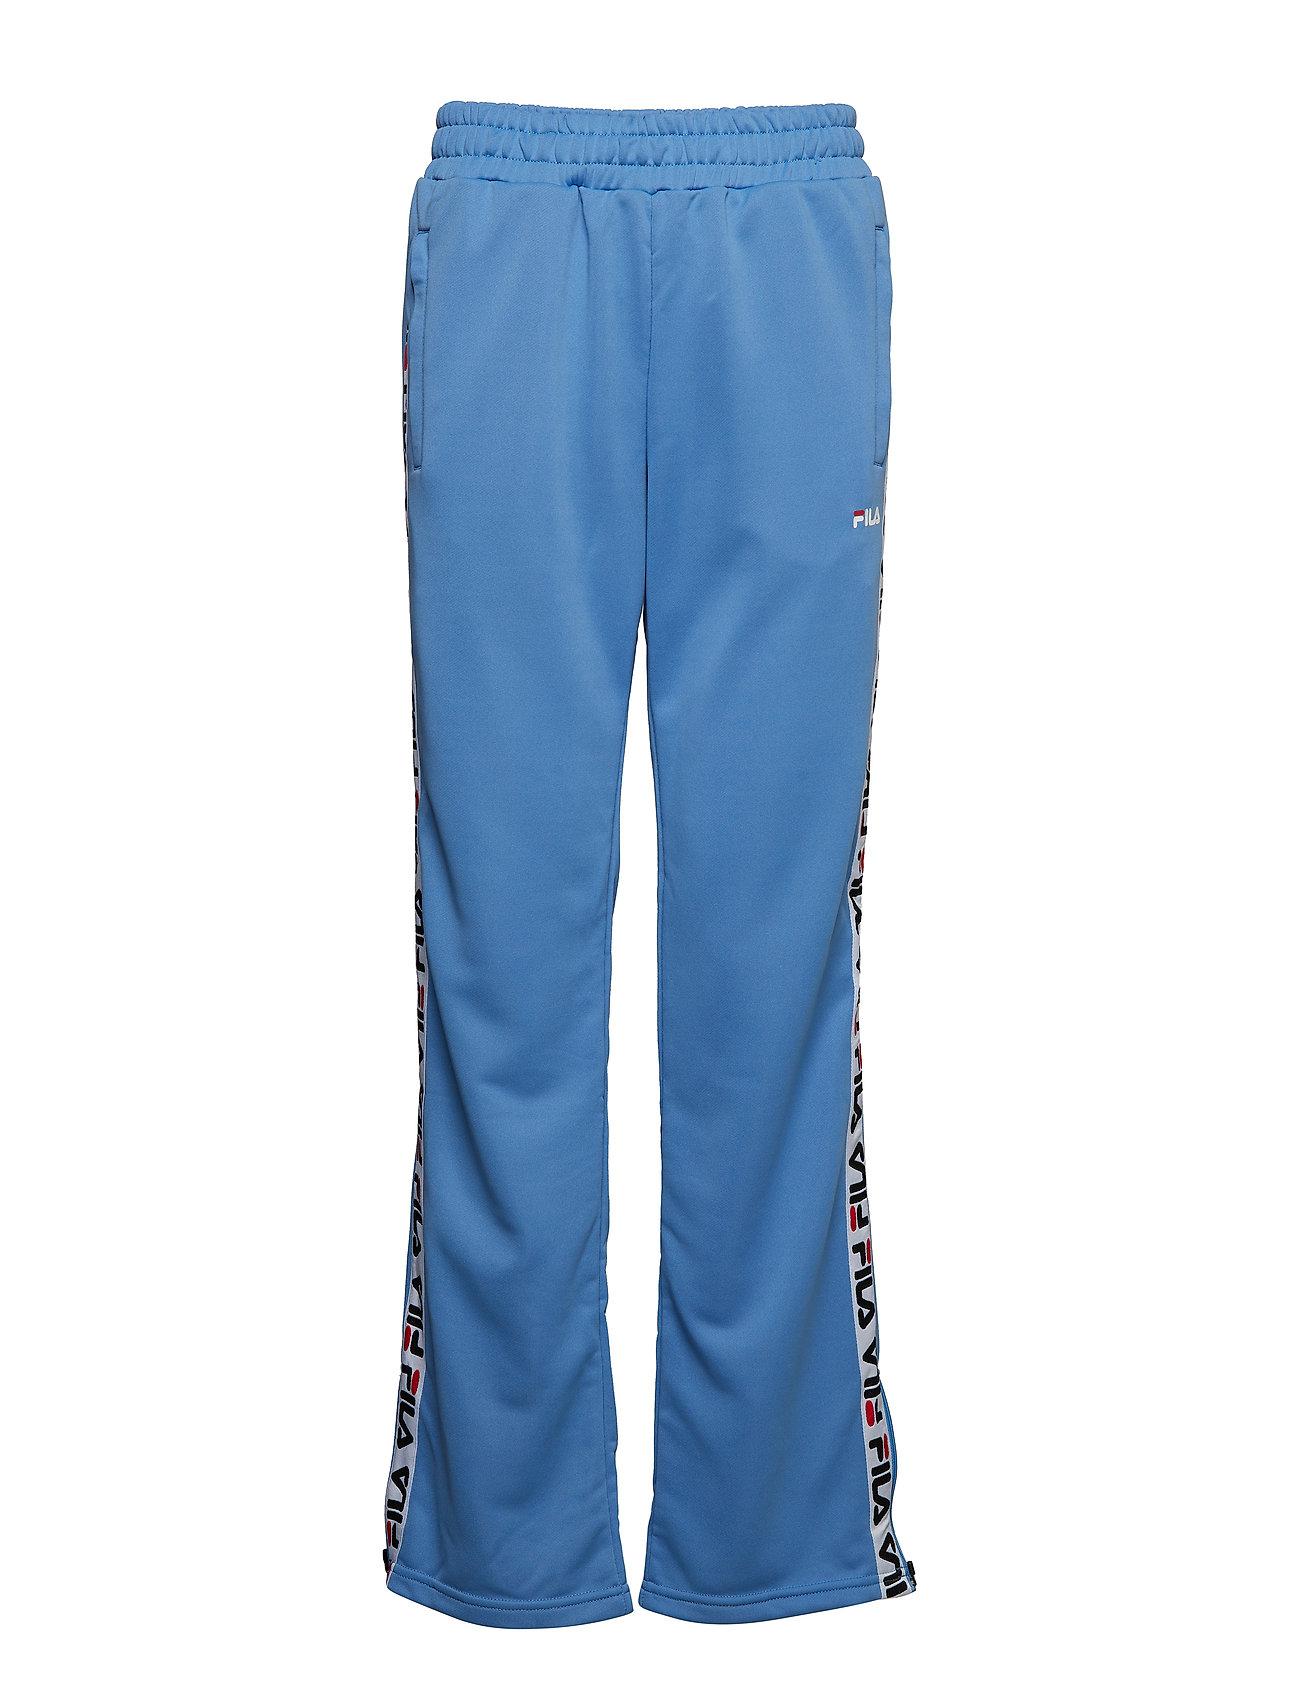 5e1a688afa60 Women Thora Track Pants (Marina) (£51.35) - FILA - | Boozt.com